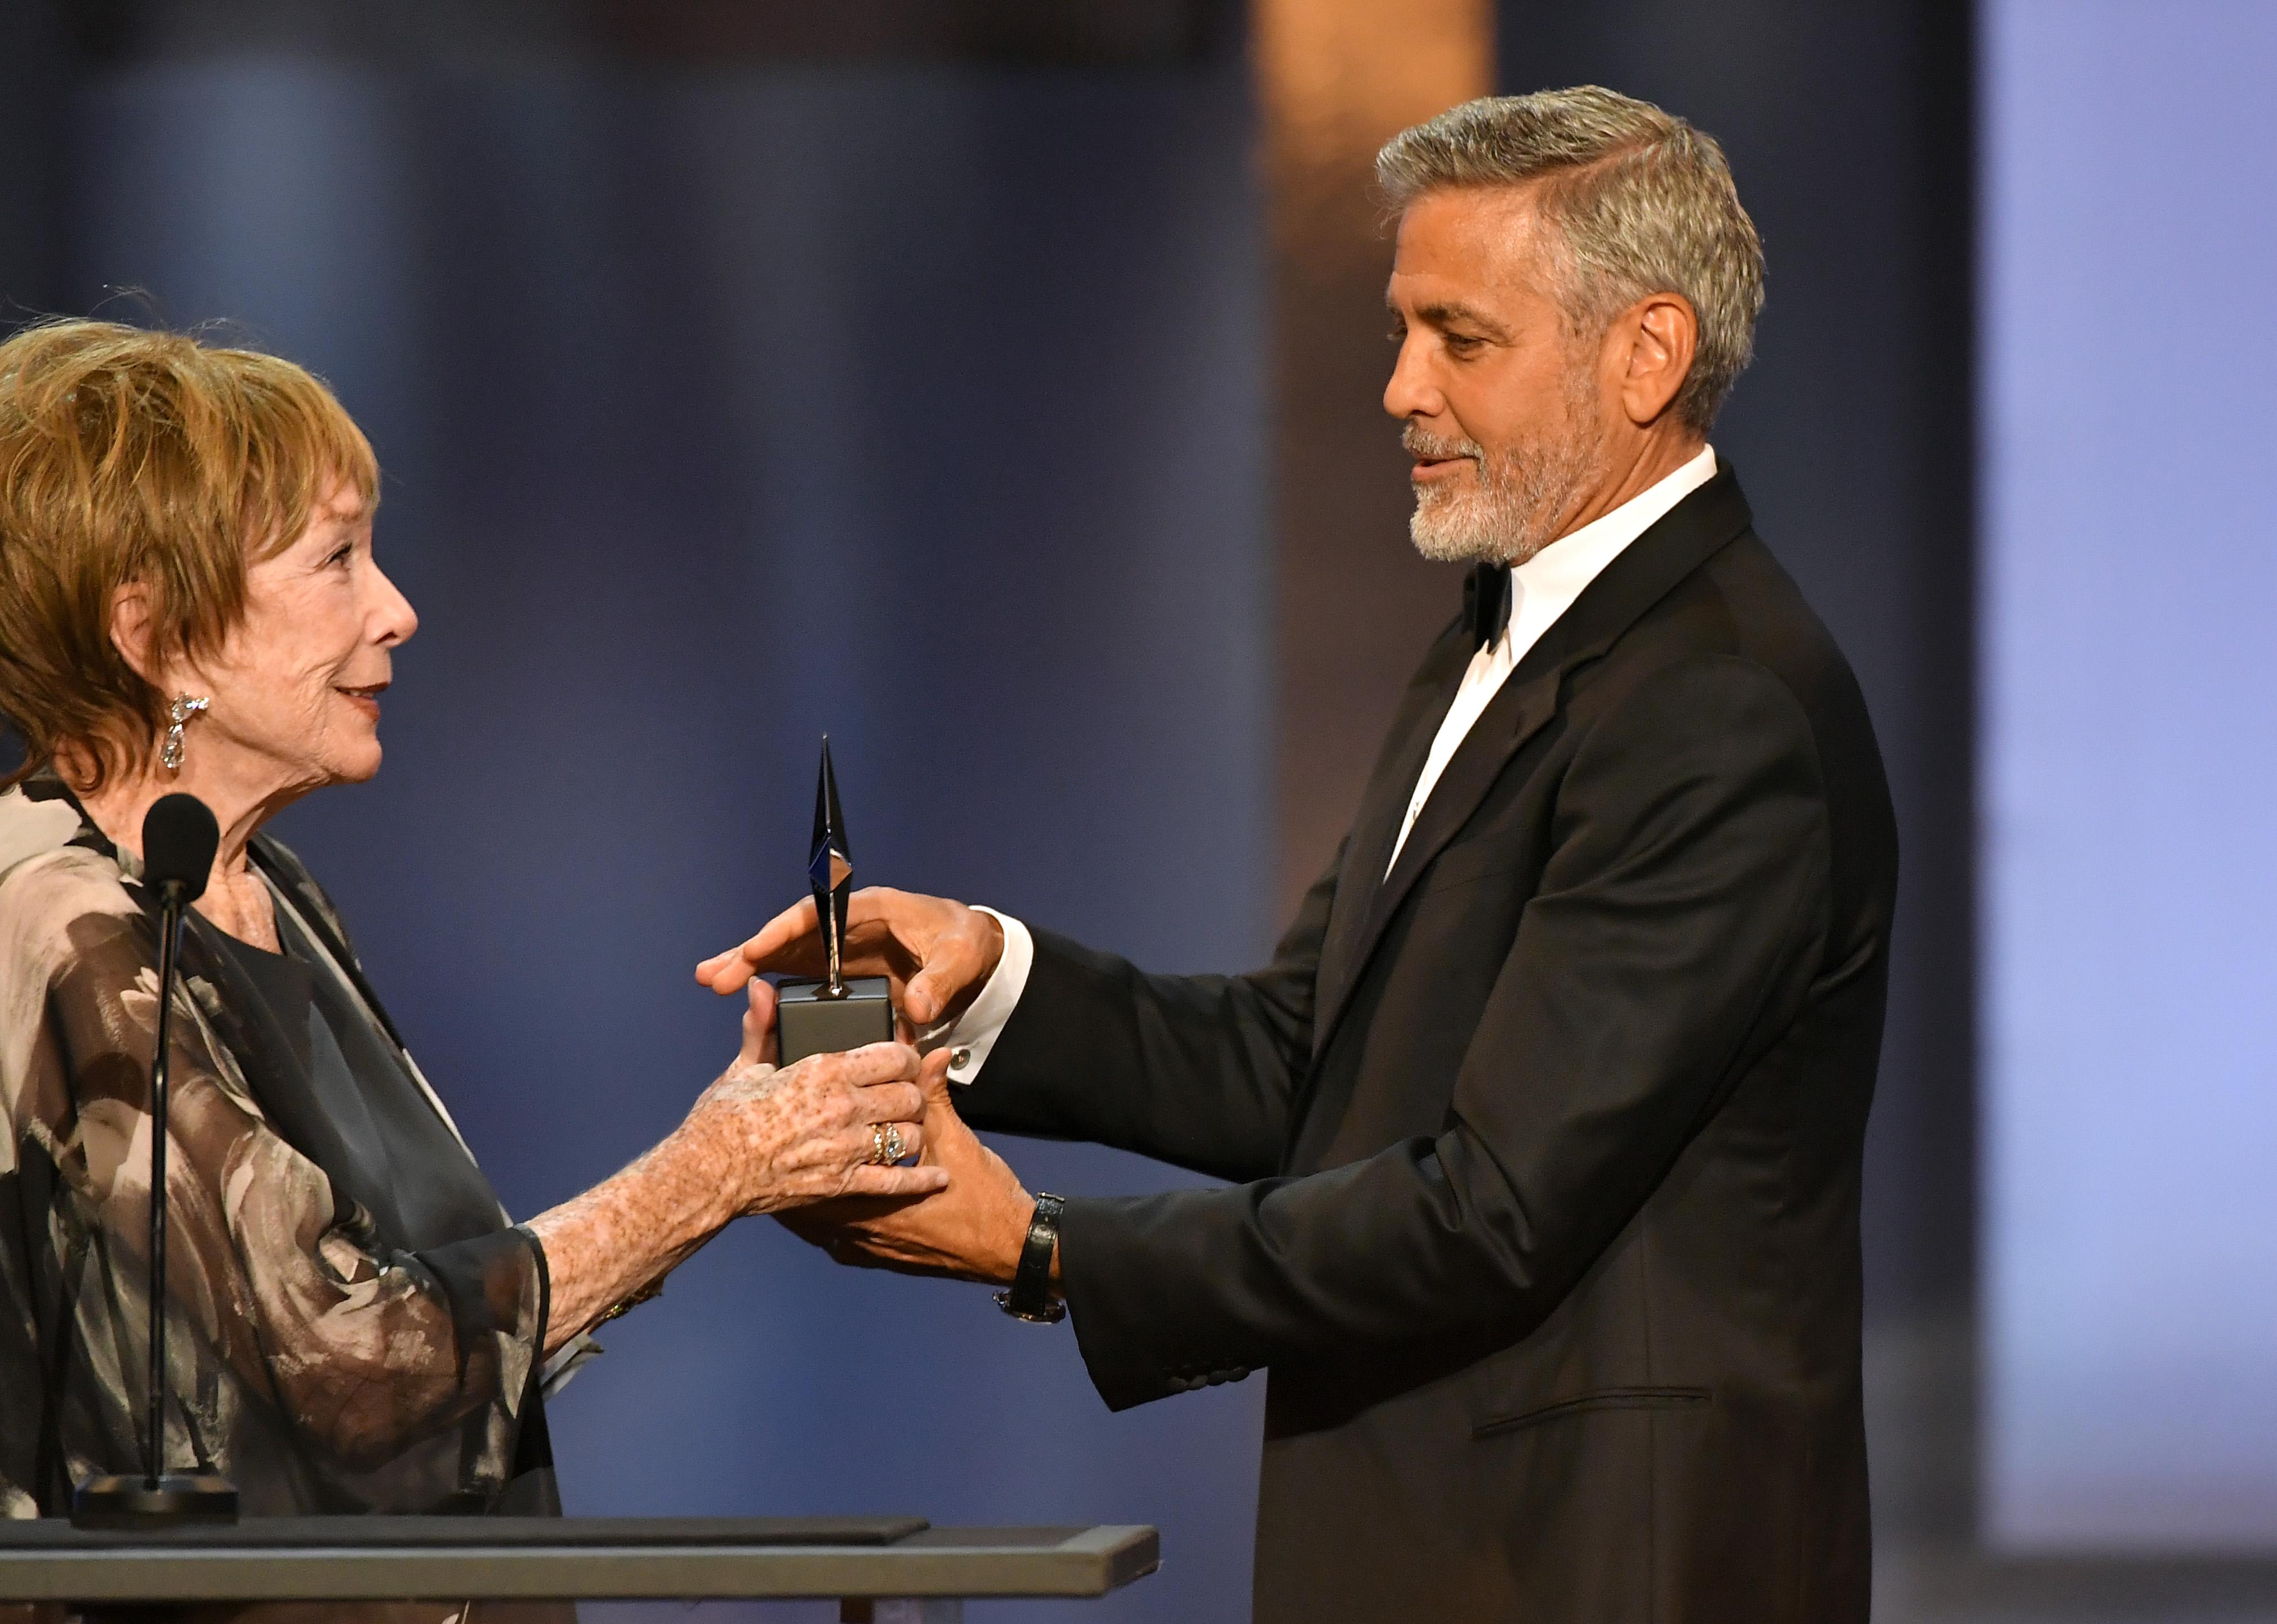 Shirley MacLaine and George ClooneyAFI Life Achievement Award Gala, Show, Los Angeles, USA - 07 Jun 2018